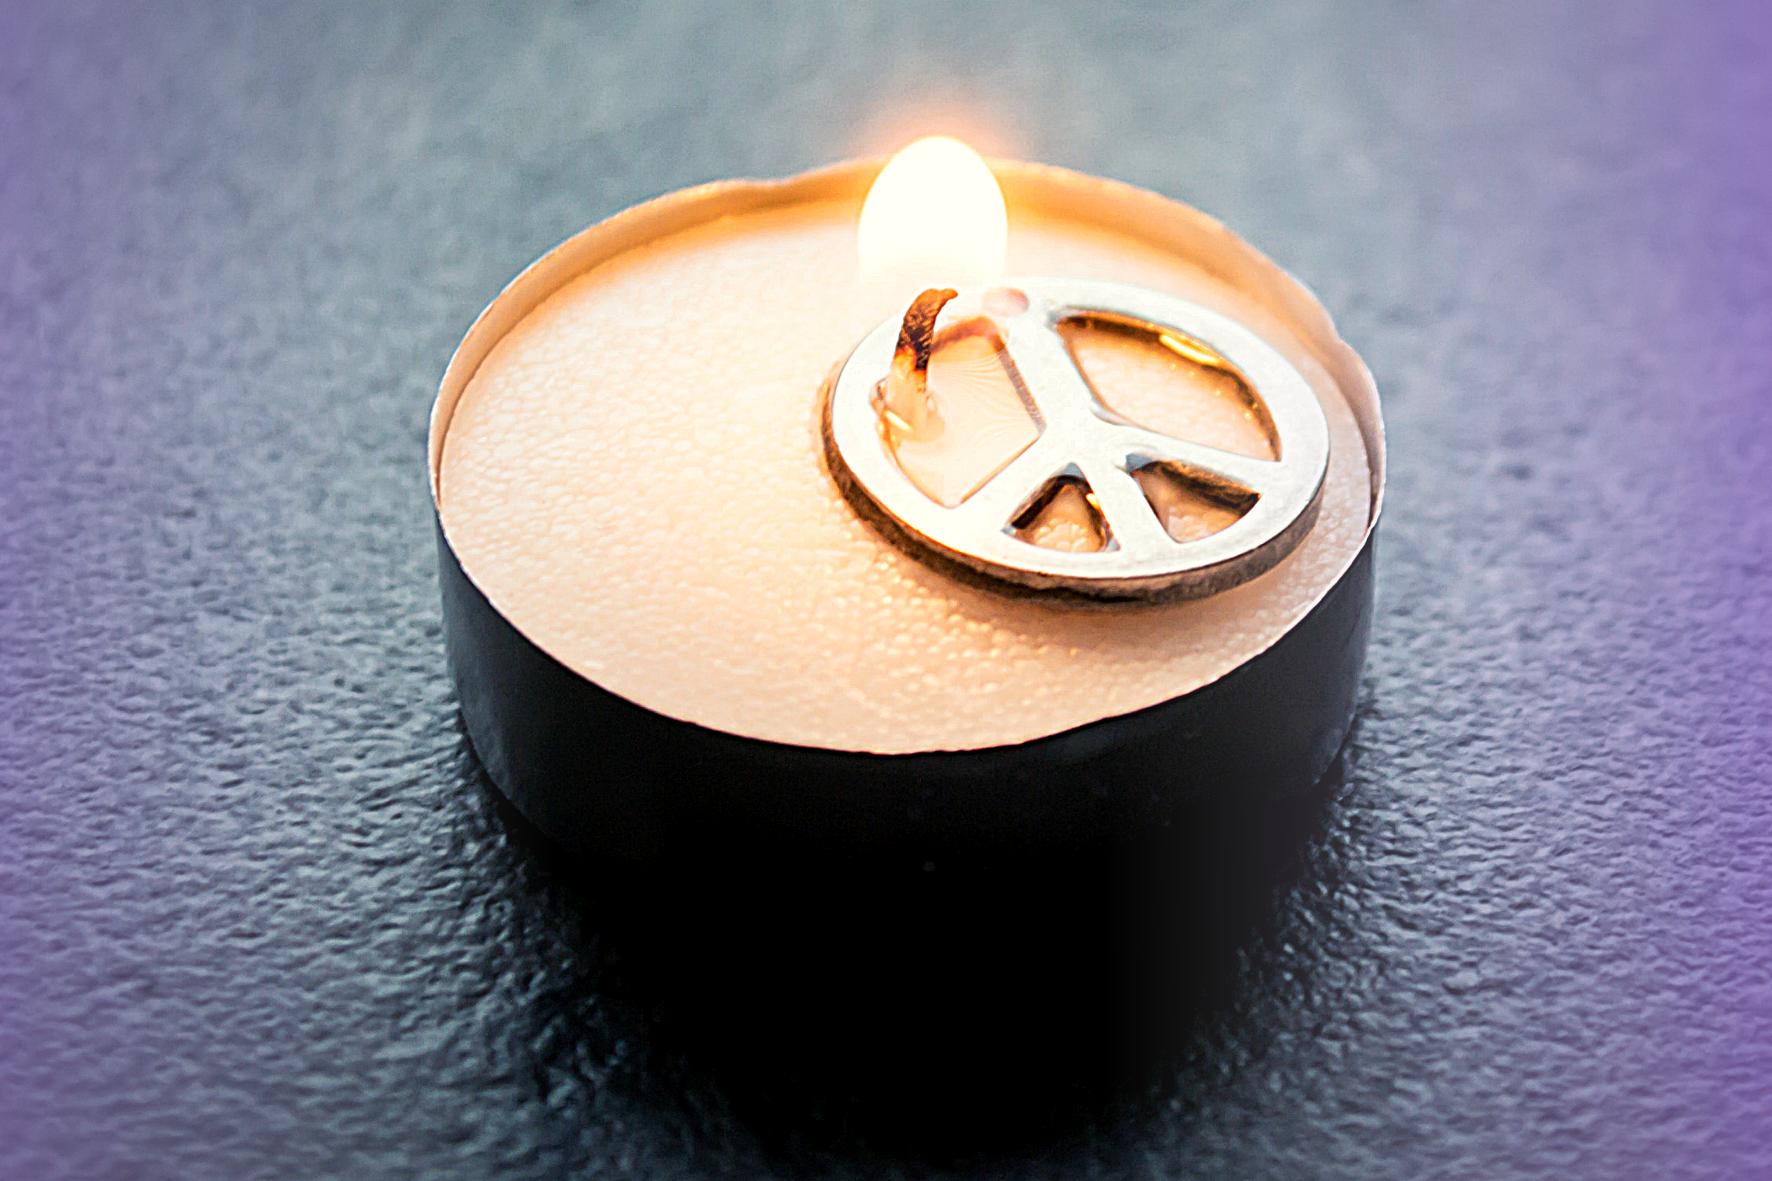 texto: A paz chega